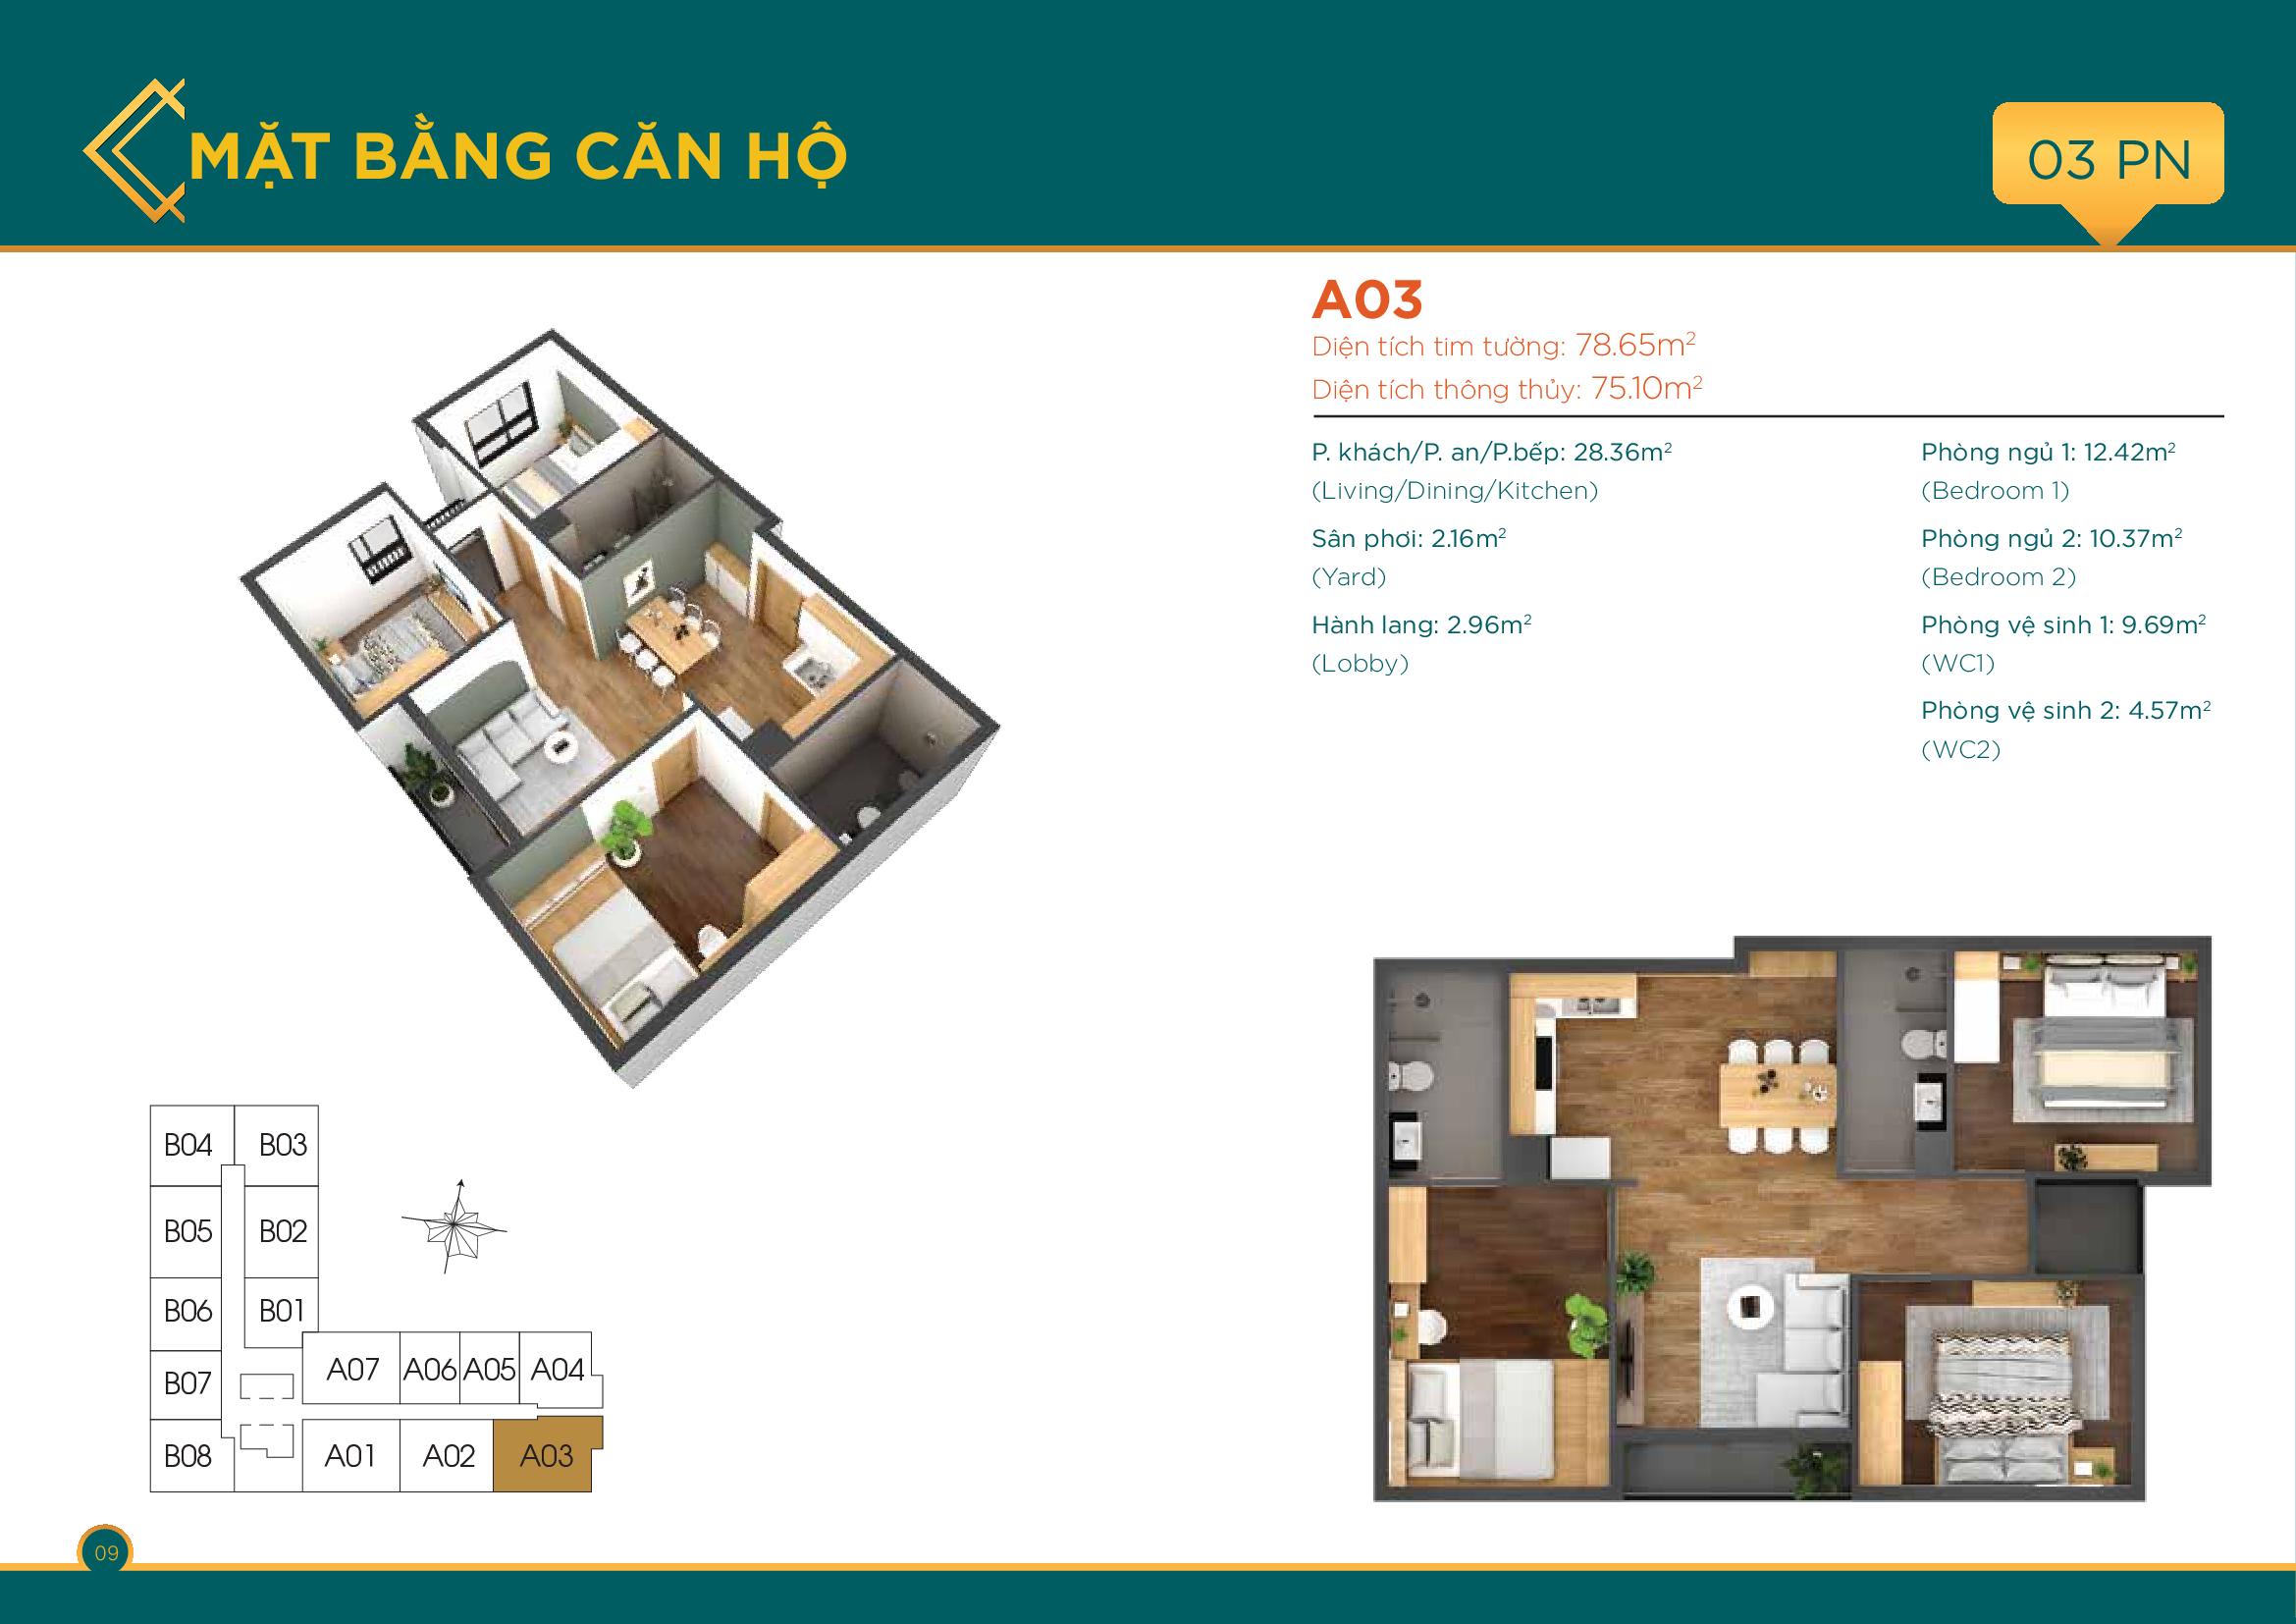 thiết kế căn hộ quận 7